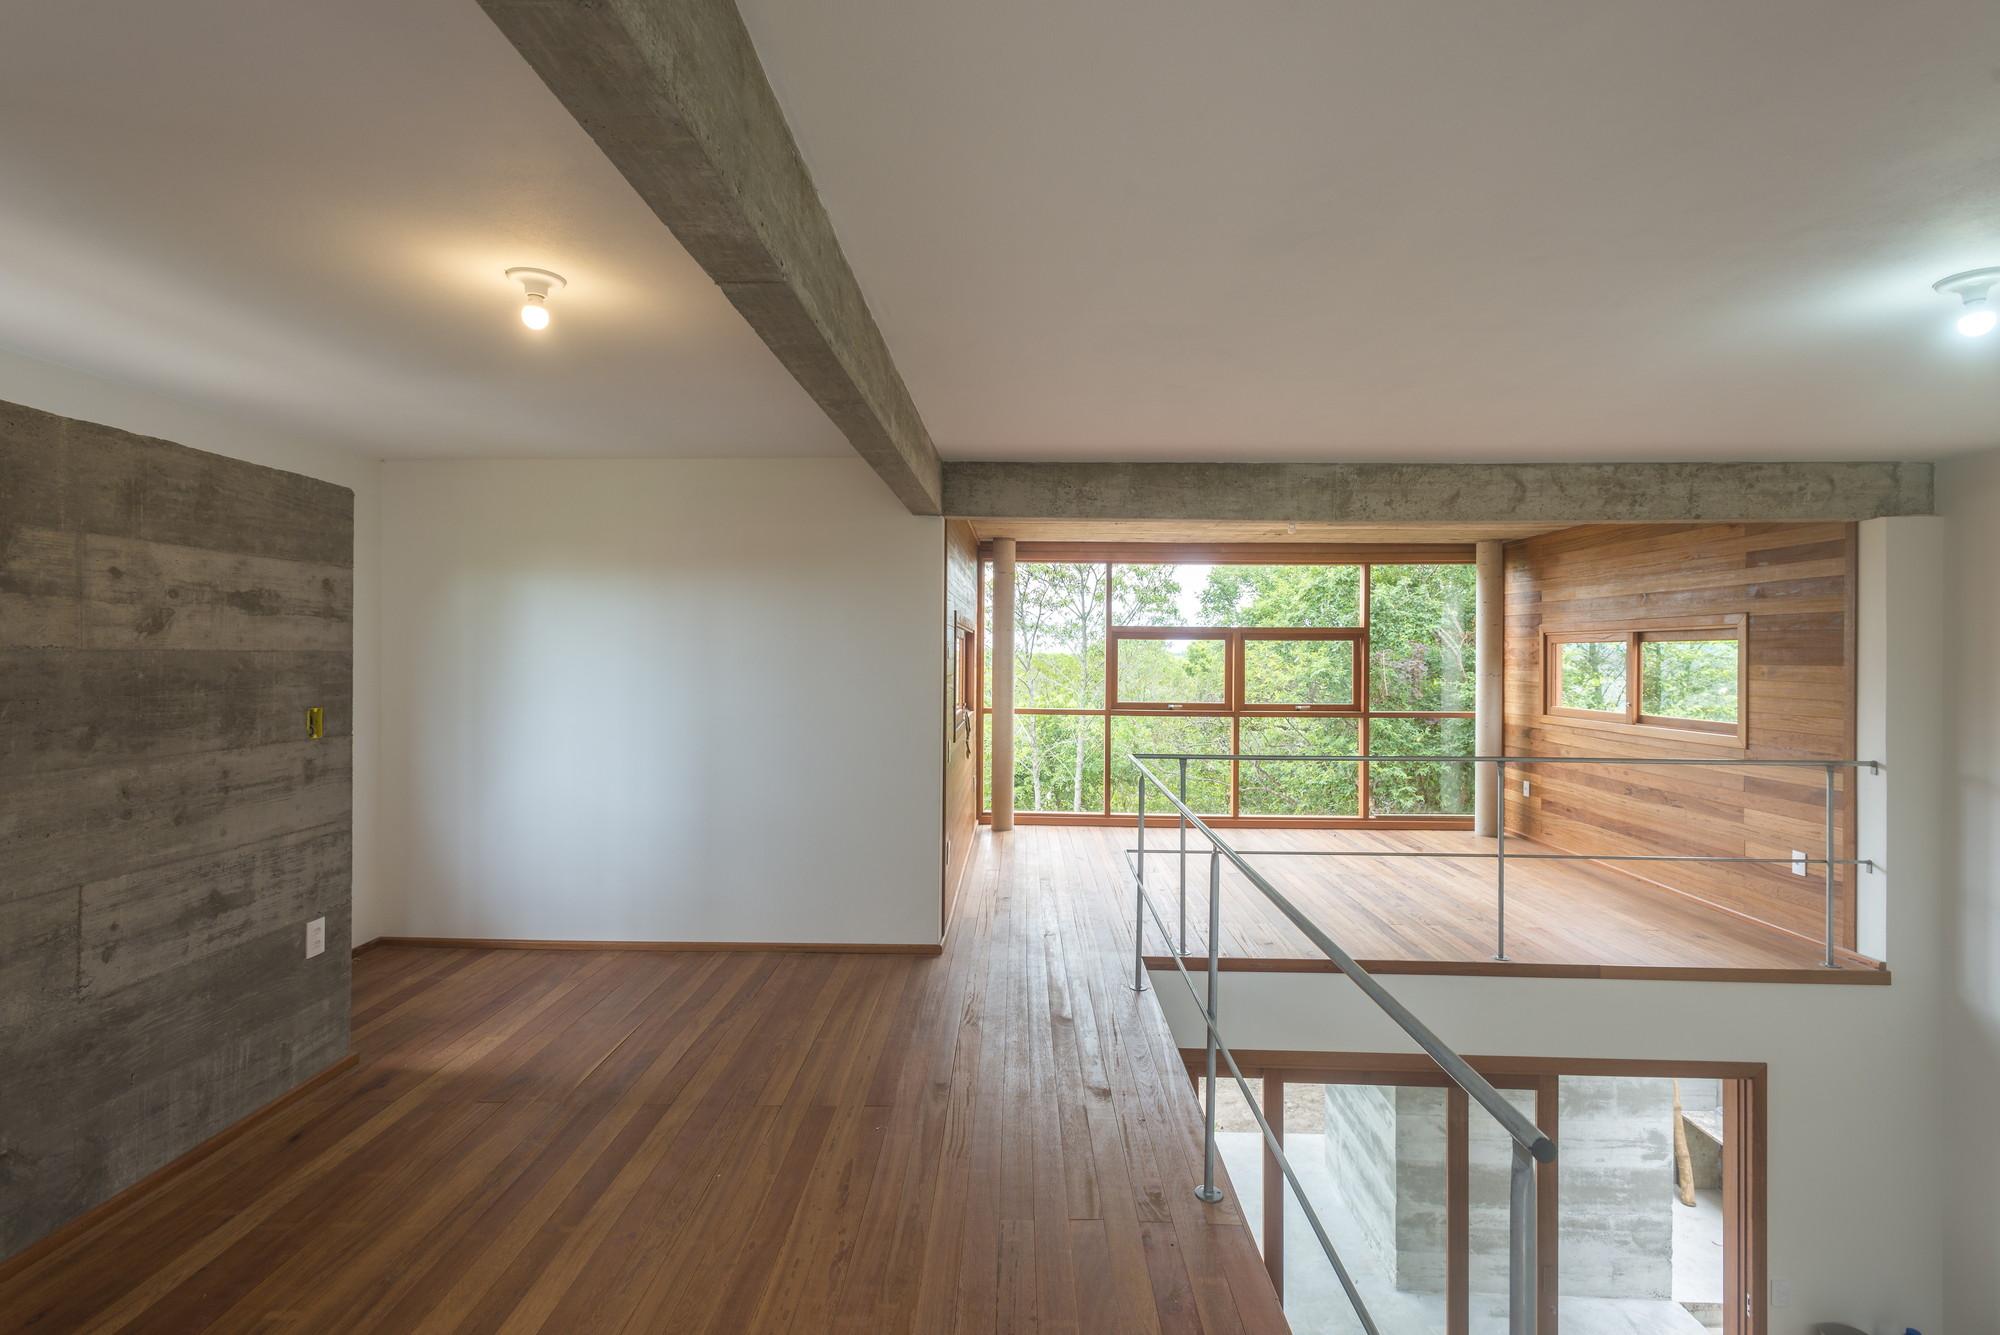 Rancho 14 / A+R arquitetura